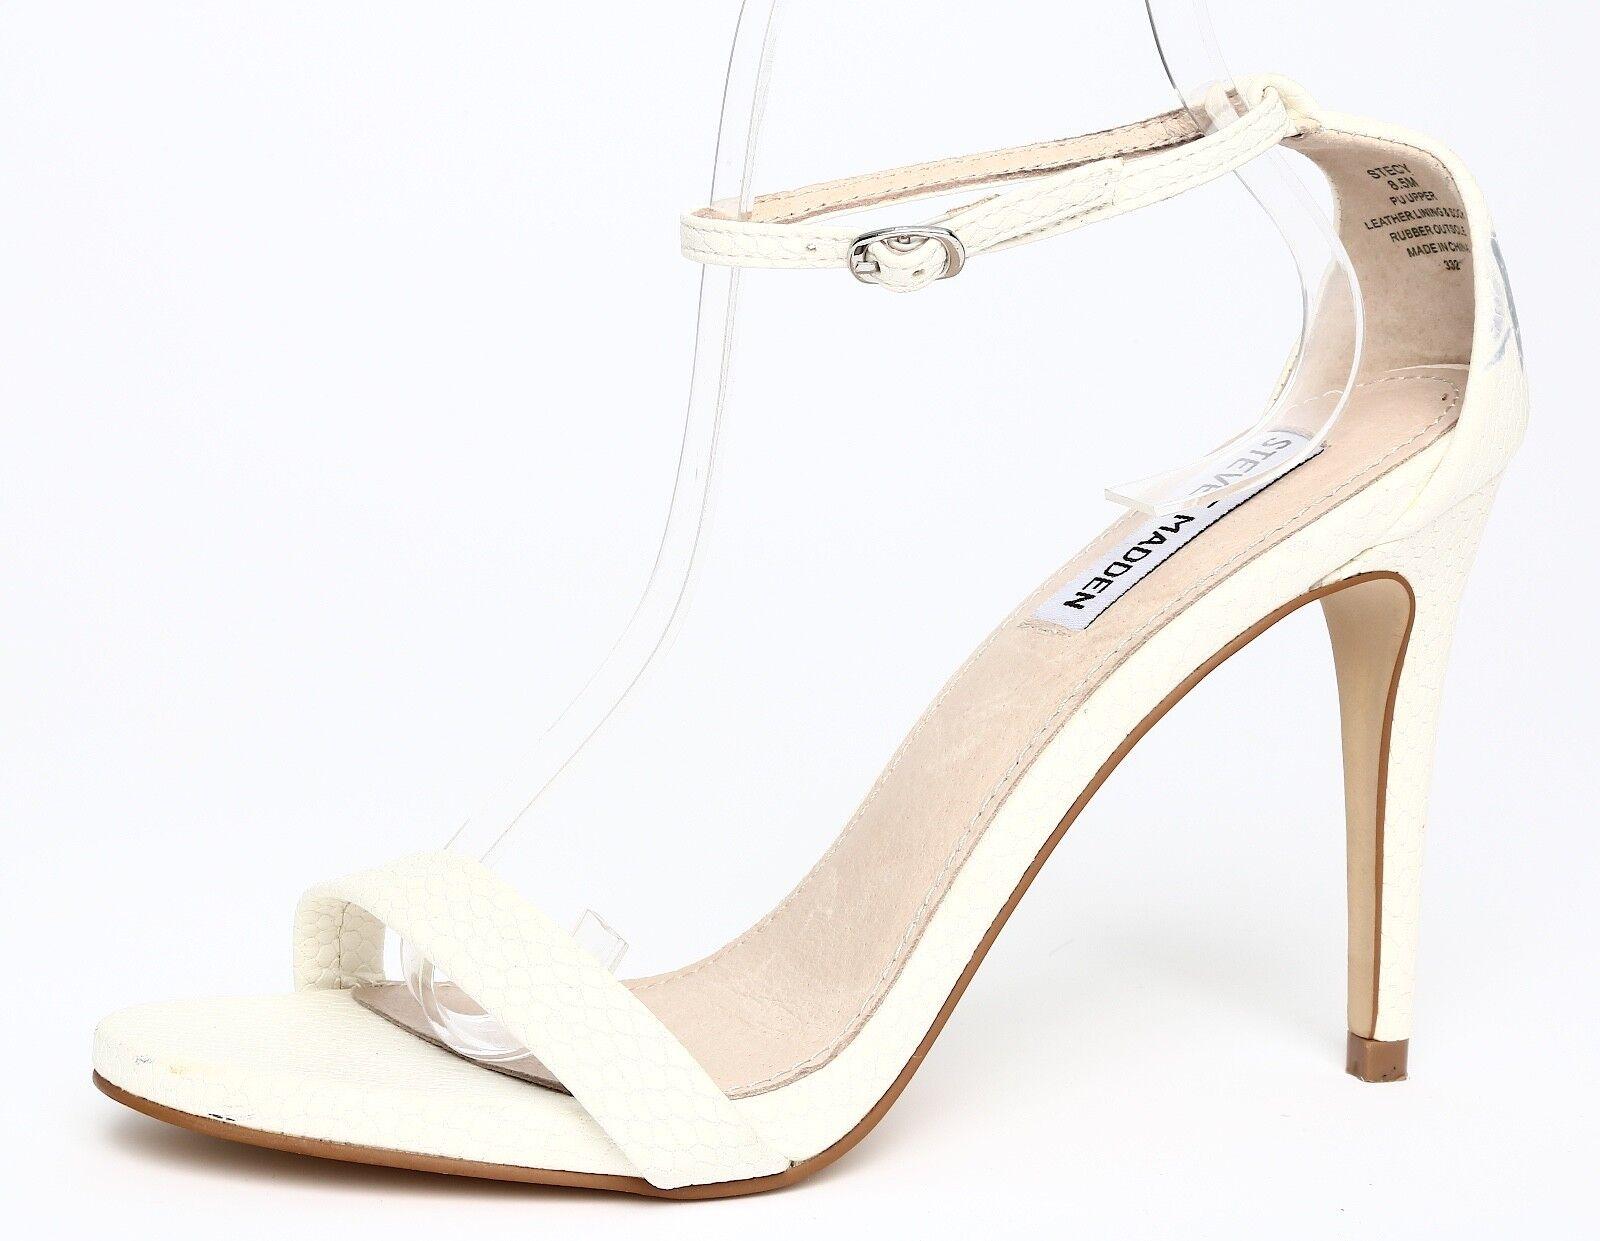 Steve Madden Stecy Leather blanc Ankle Strap Sandal Heels Sz 8.5M 2570